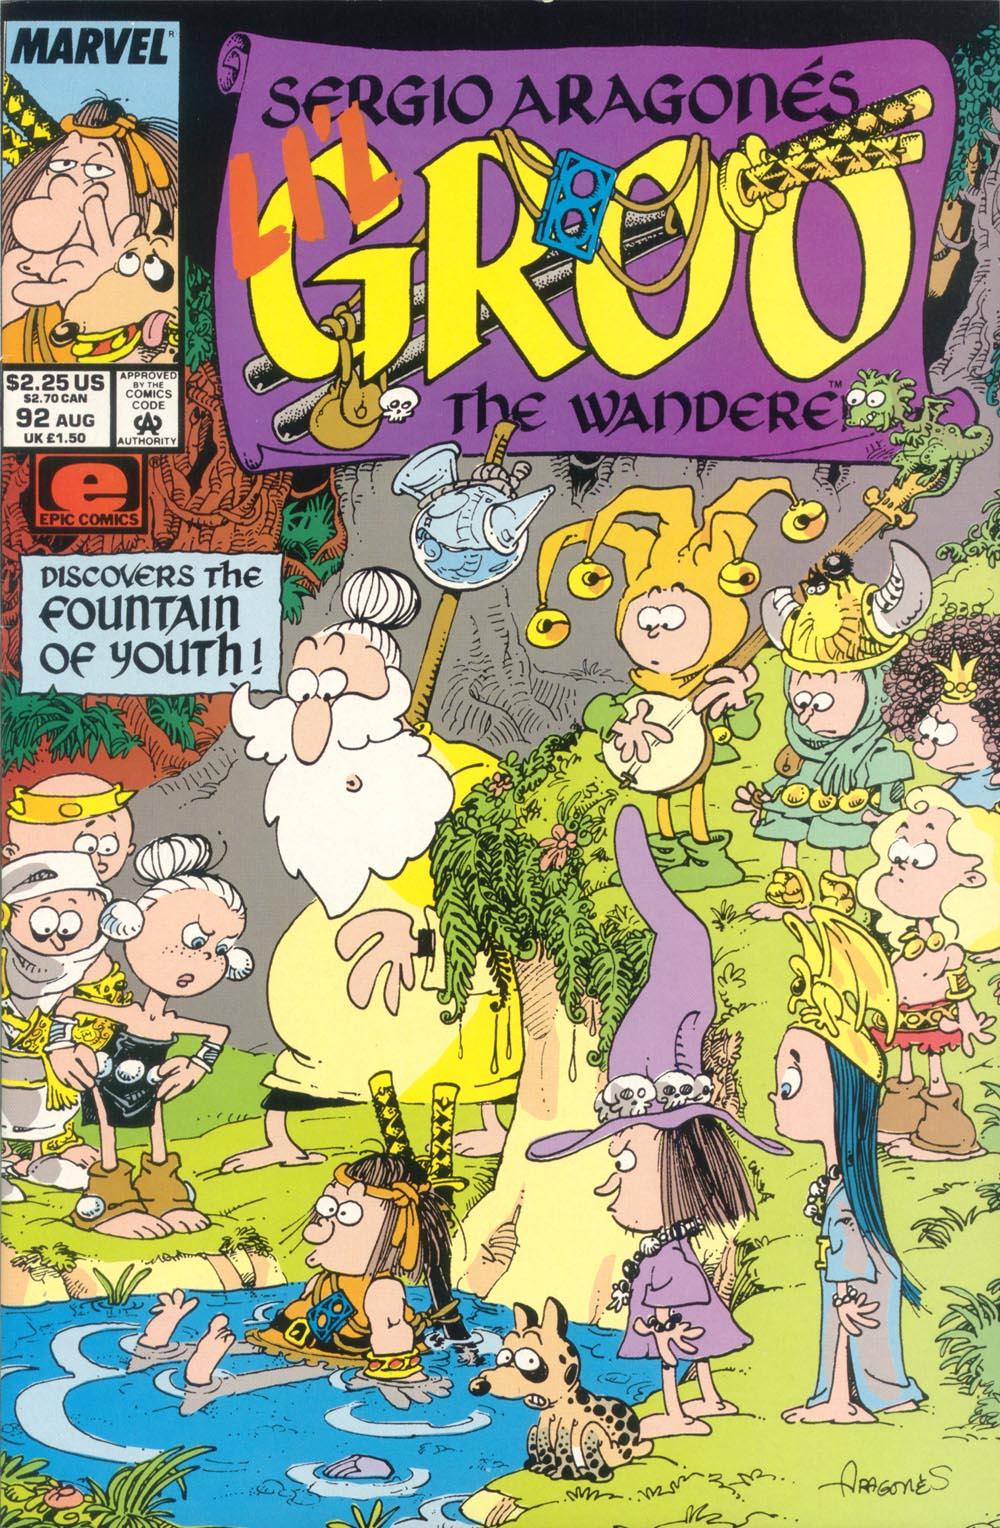 Read online Sergio Aragonés Groo the Wanderer comic -  Issue #92 - 1